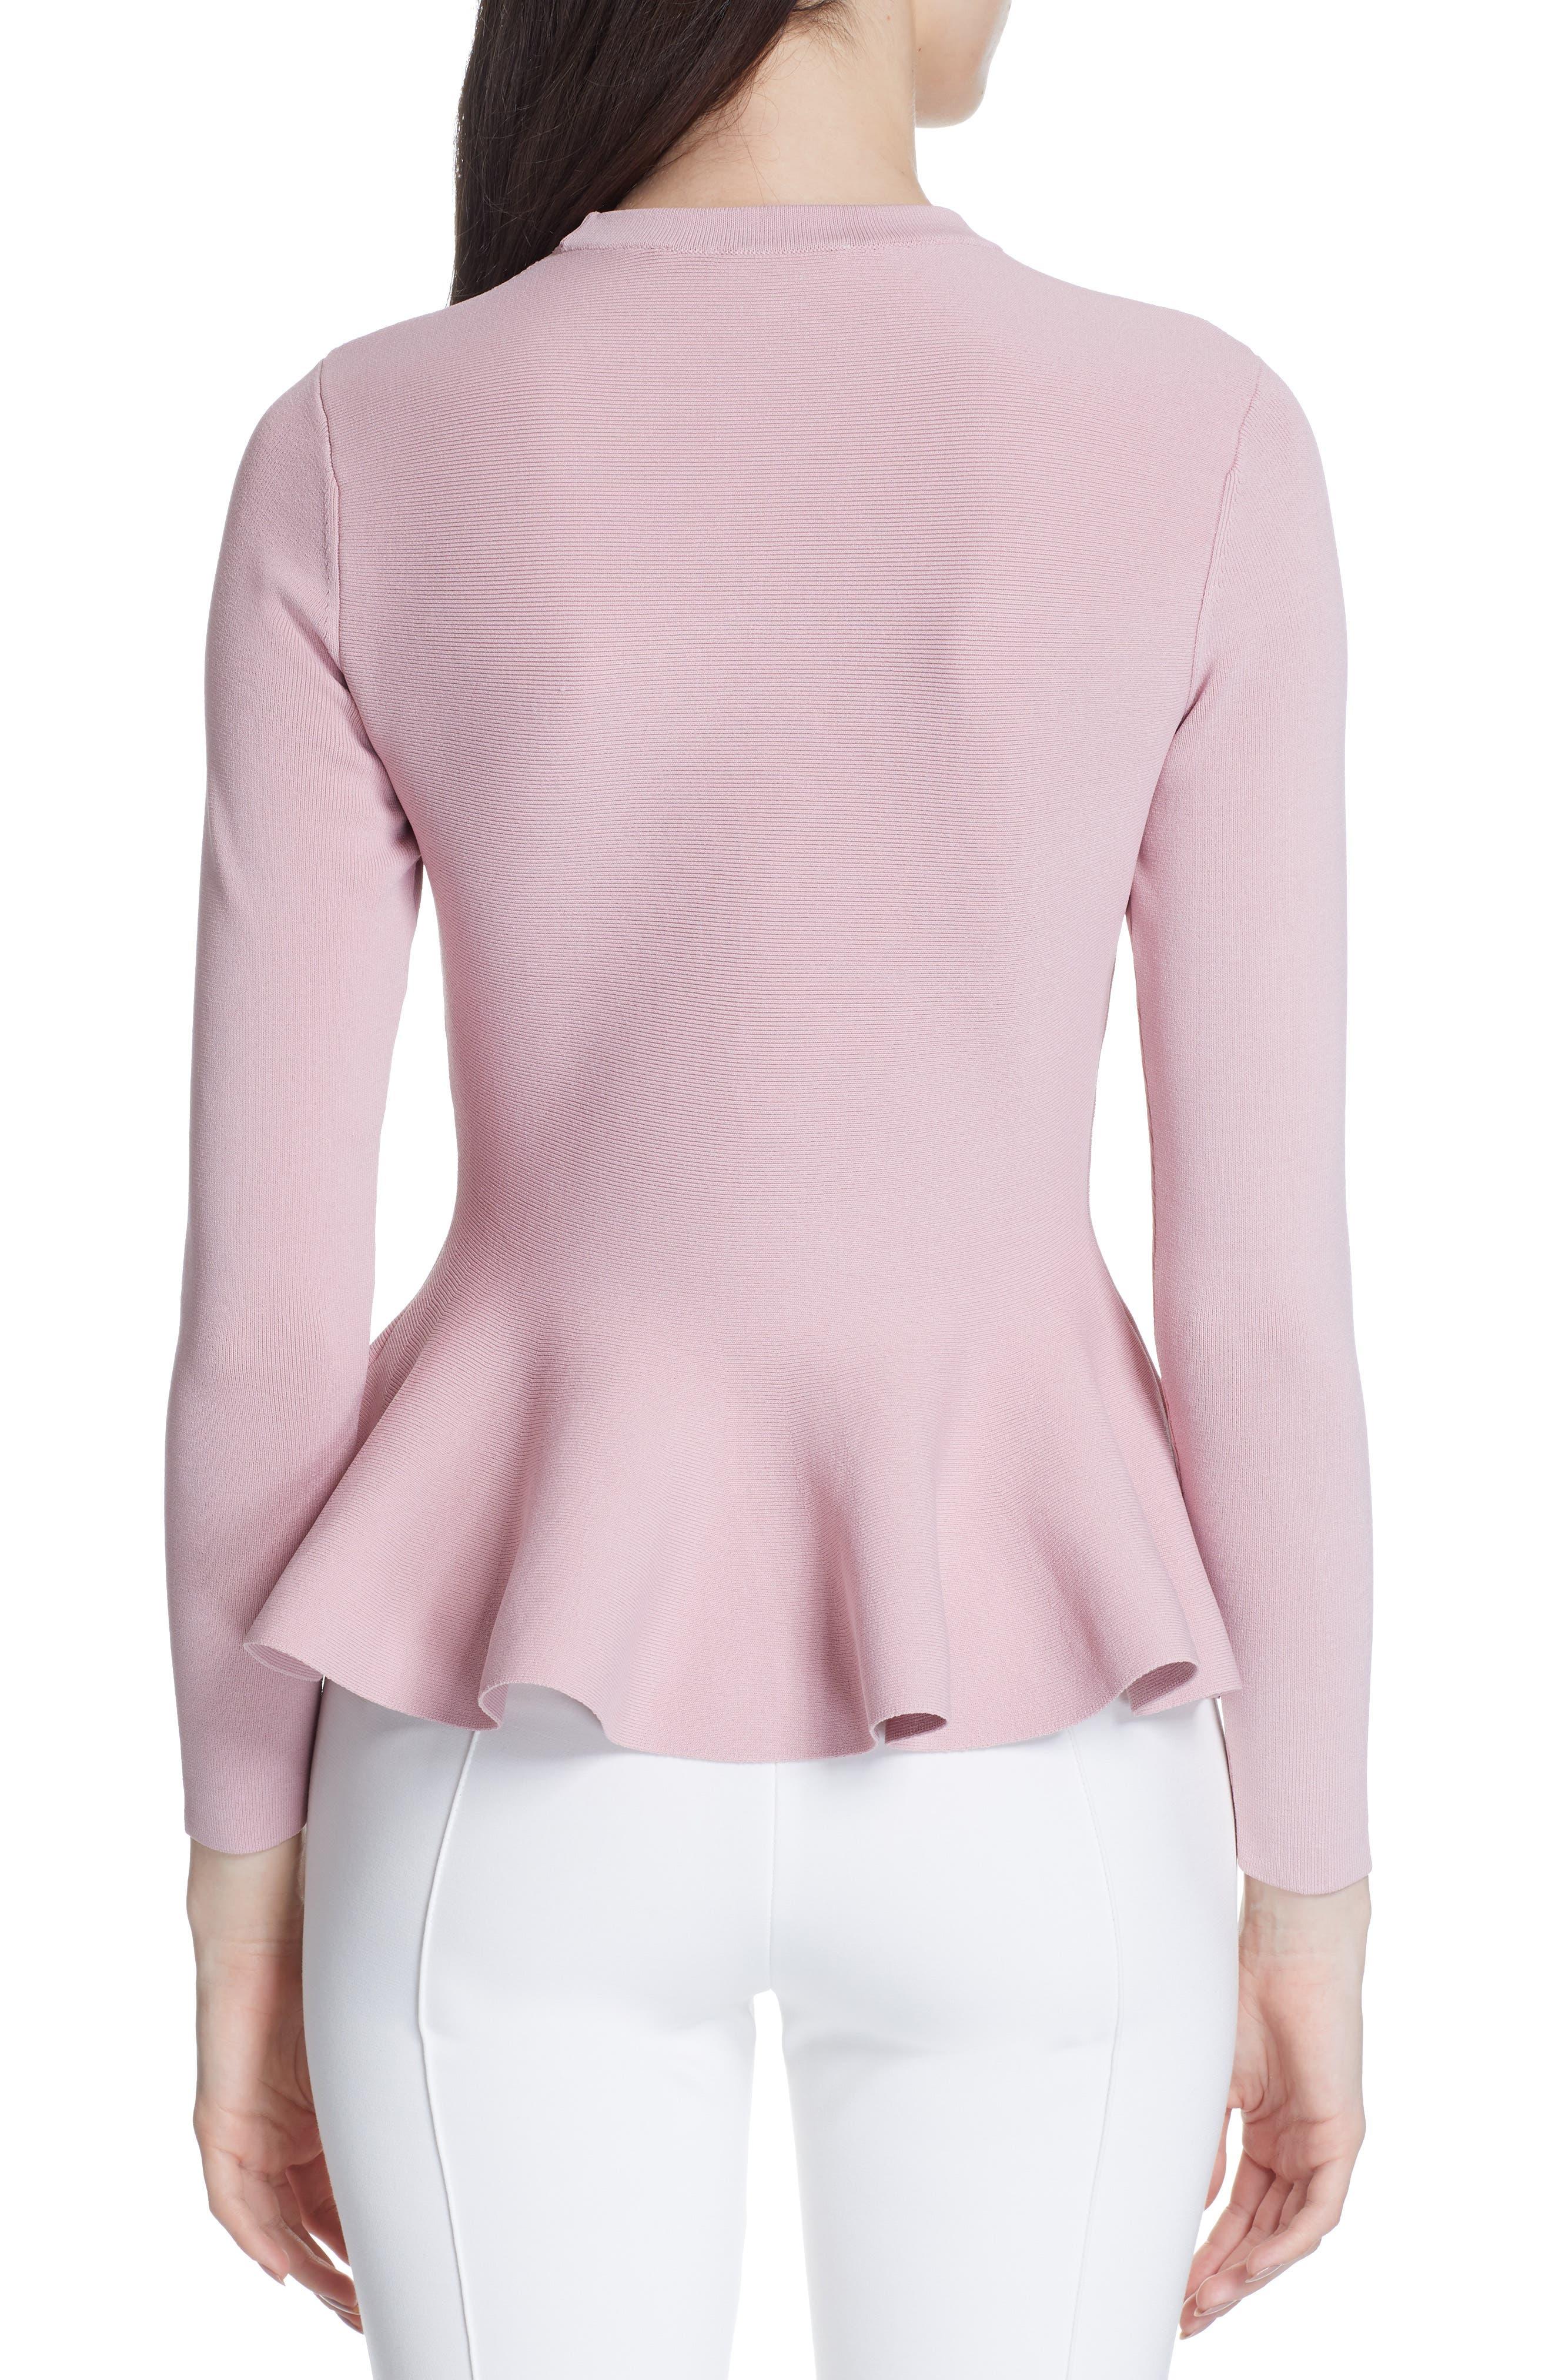 Hinlia Peplum Sweater,                             Alternate thumbnail 2, color,                             DUSKY PINK